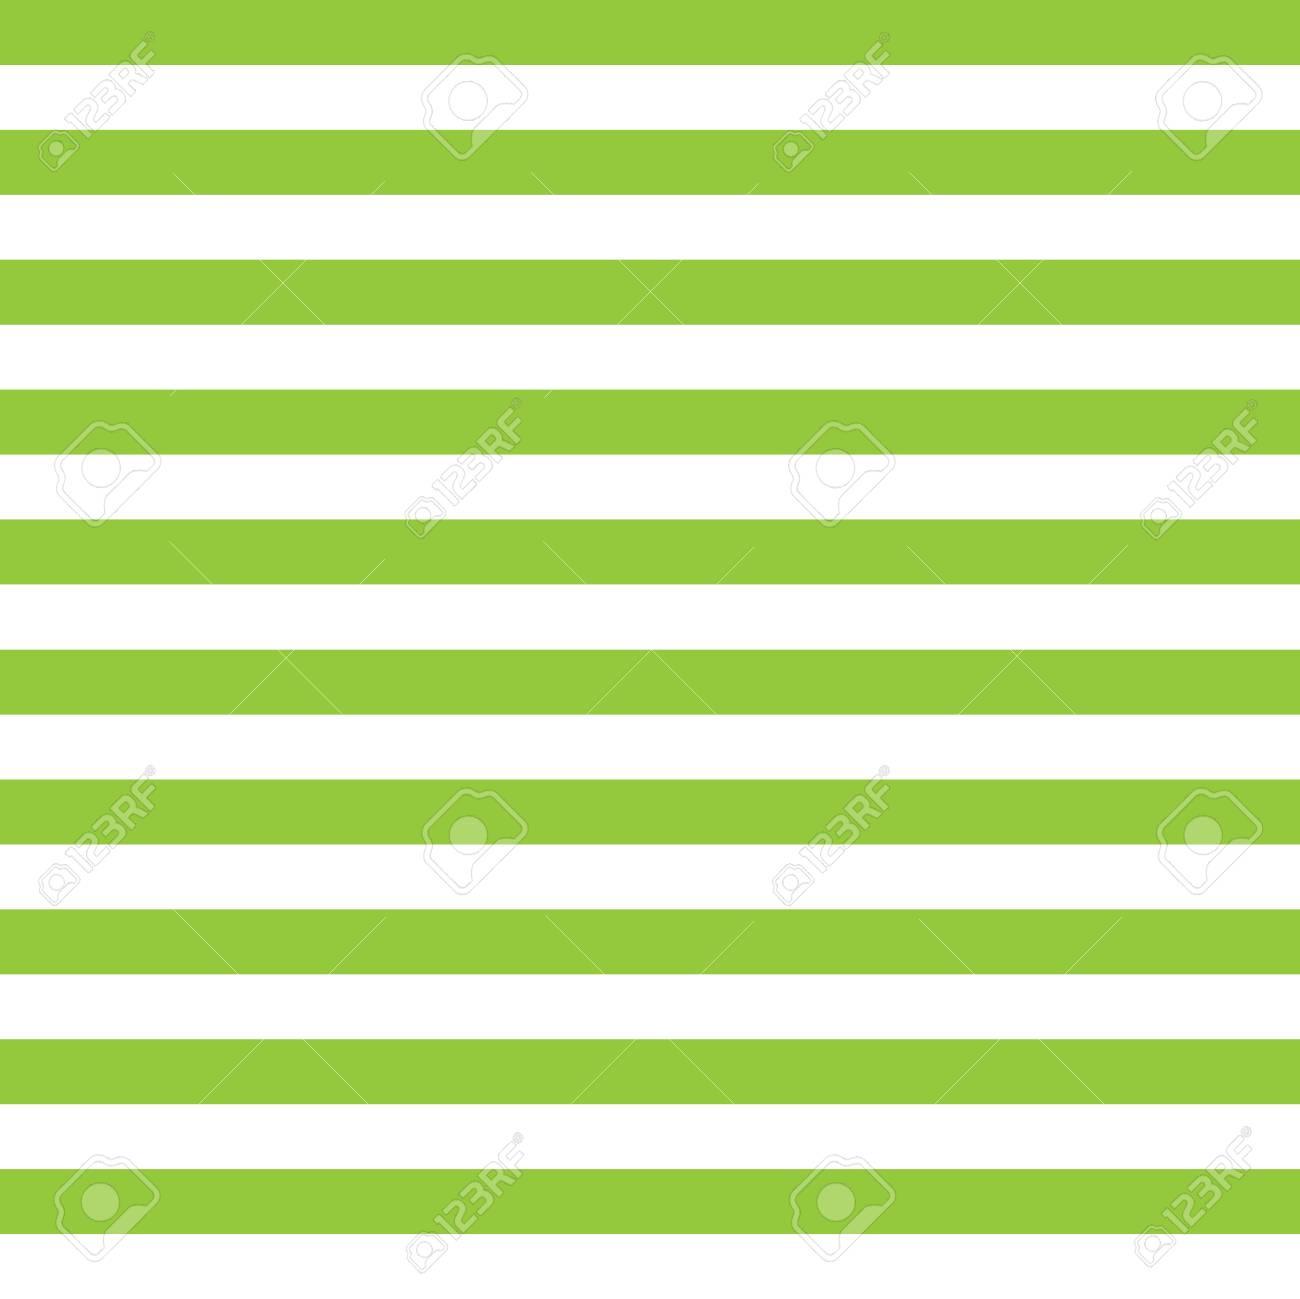 green stripes vector background with horizontal lines nature rh 123rf com decorative horizontal line vector Gray Thick Horizontal Line